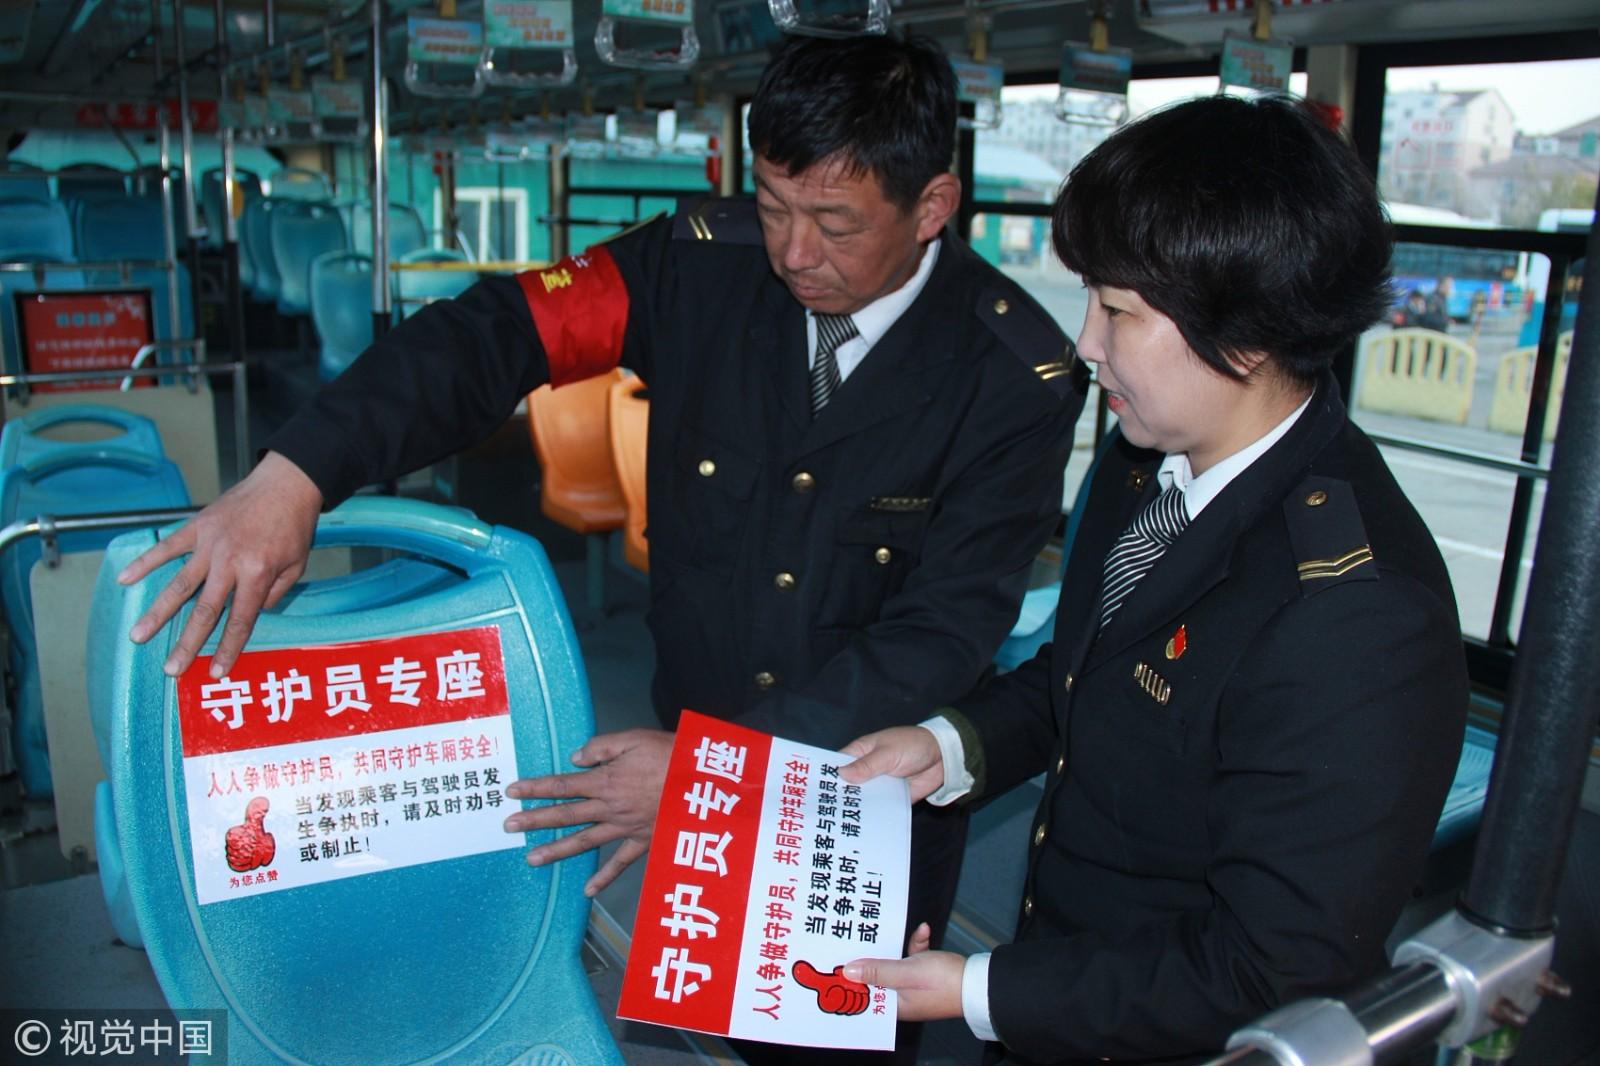 Photos: Qingdao bus set special 'guard' seat to prevent driver-passenger quarrel